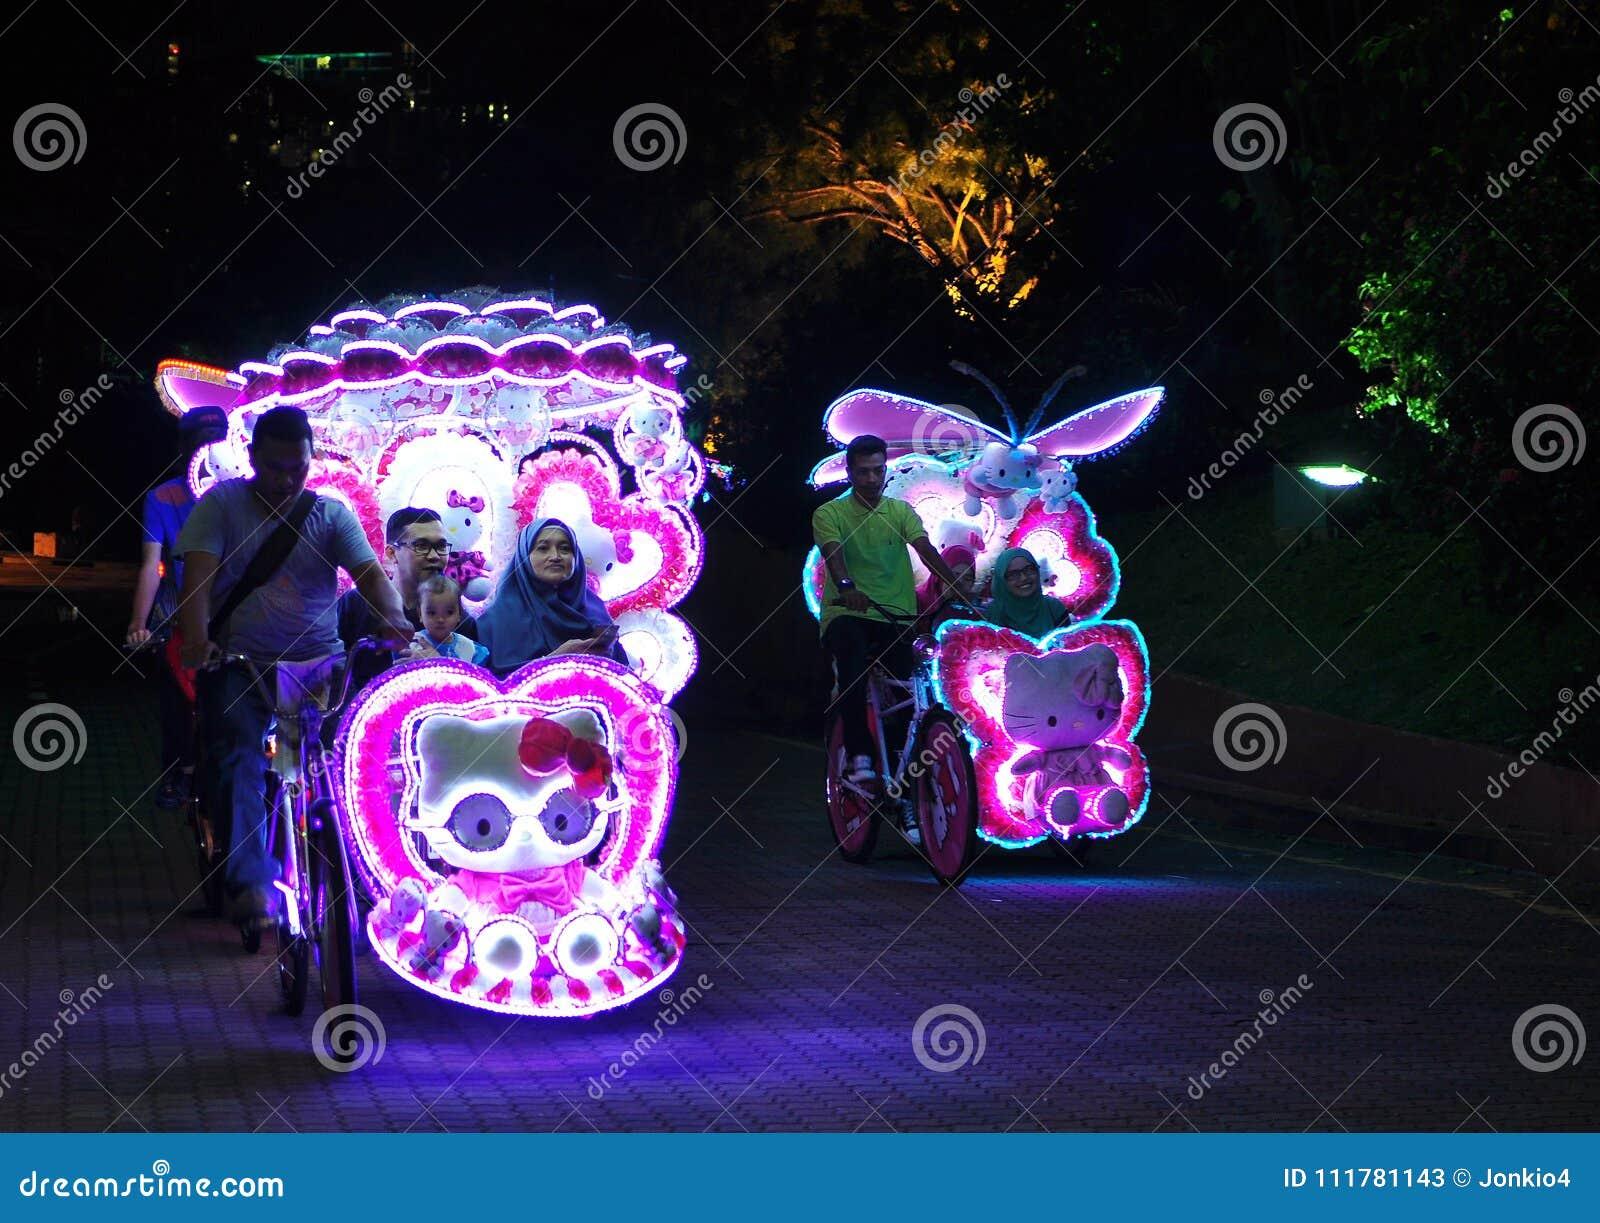 Illuminated decorated trishaw with soft toys at night in Malacca, Malaysia